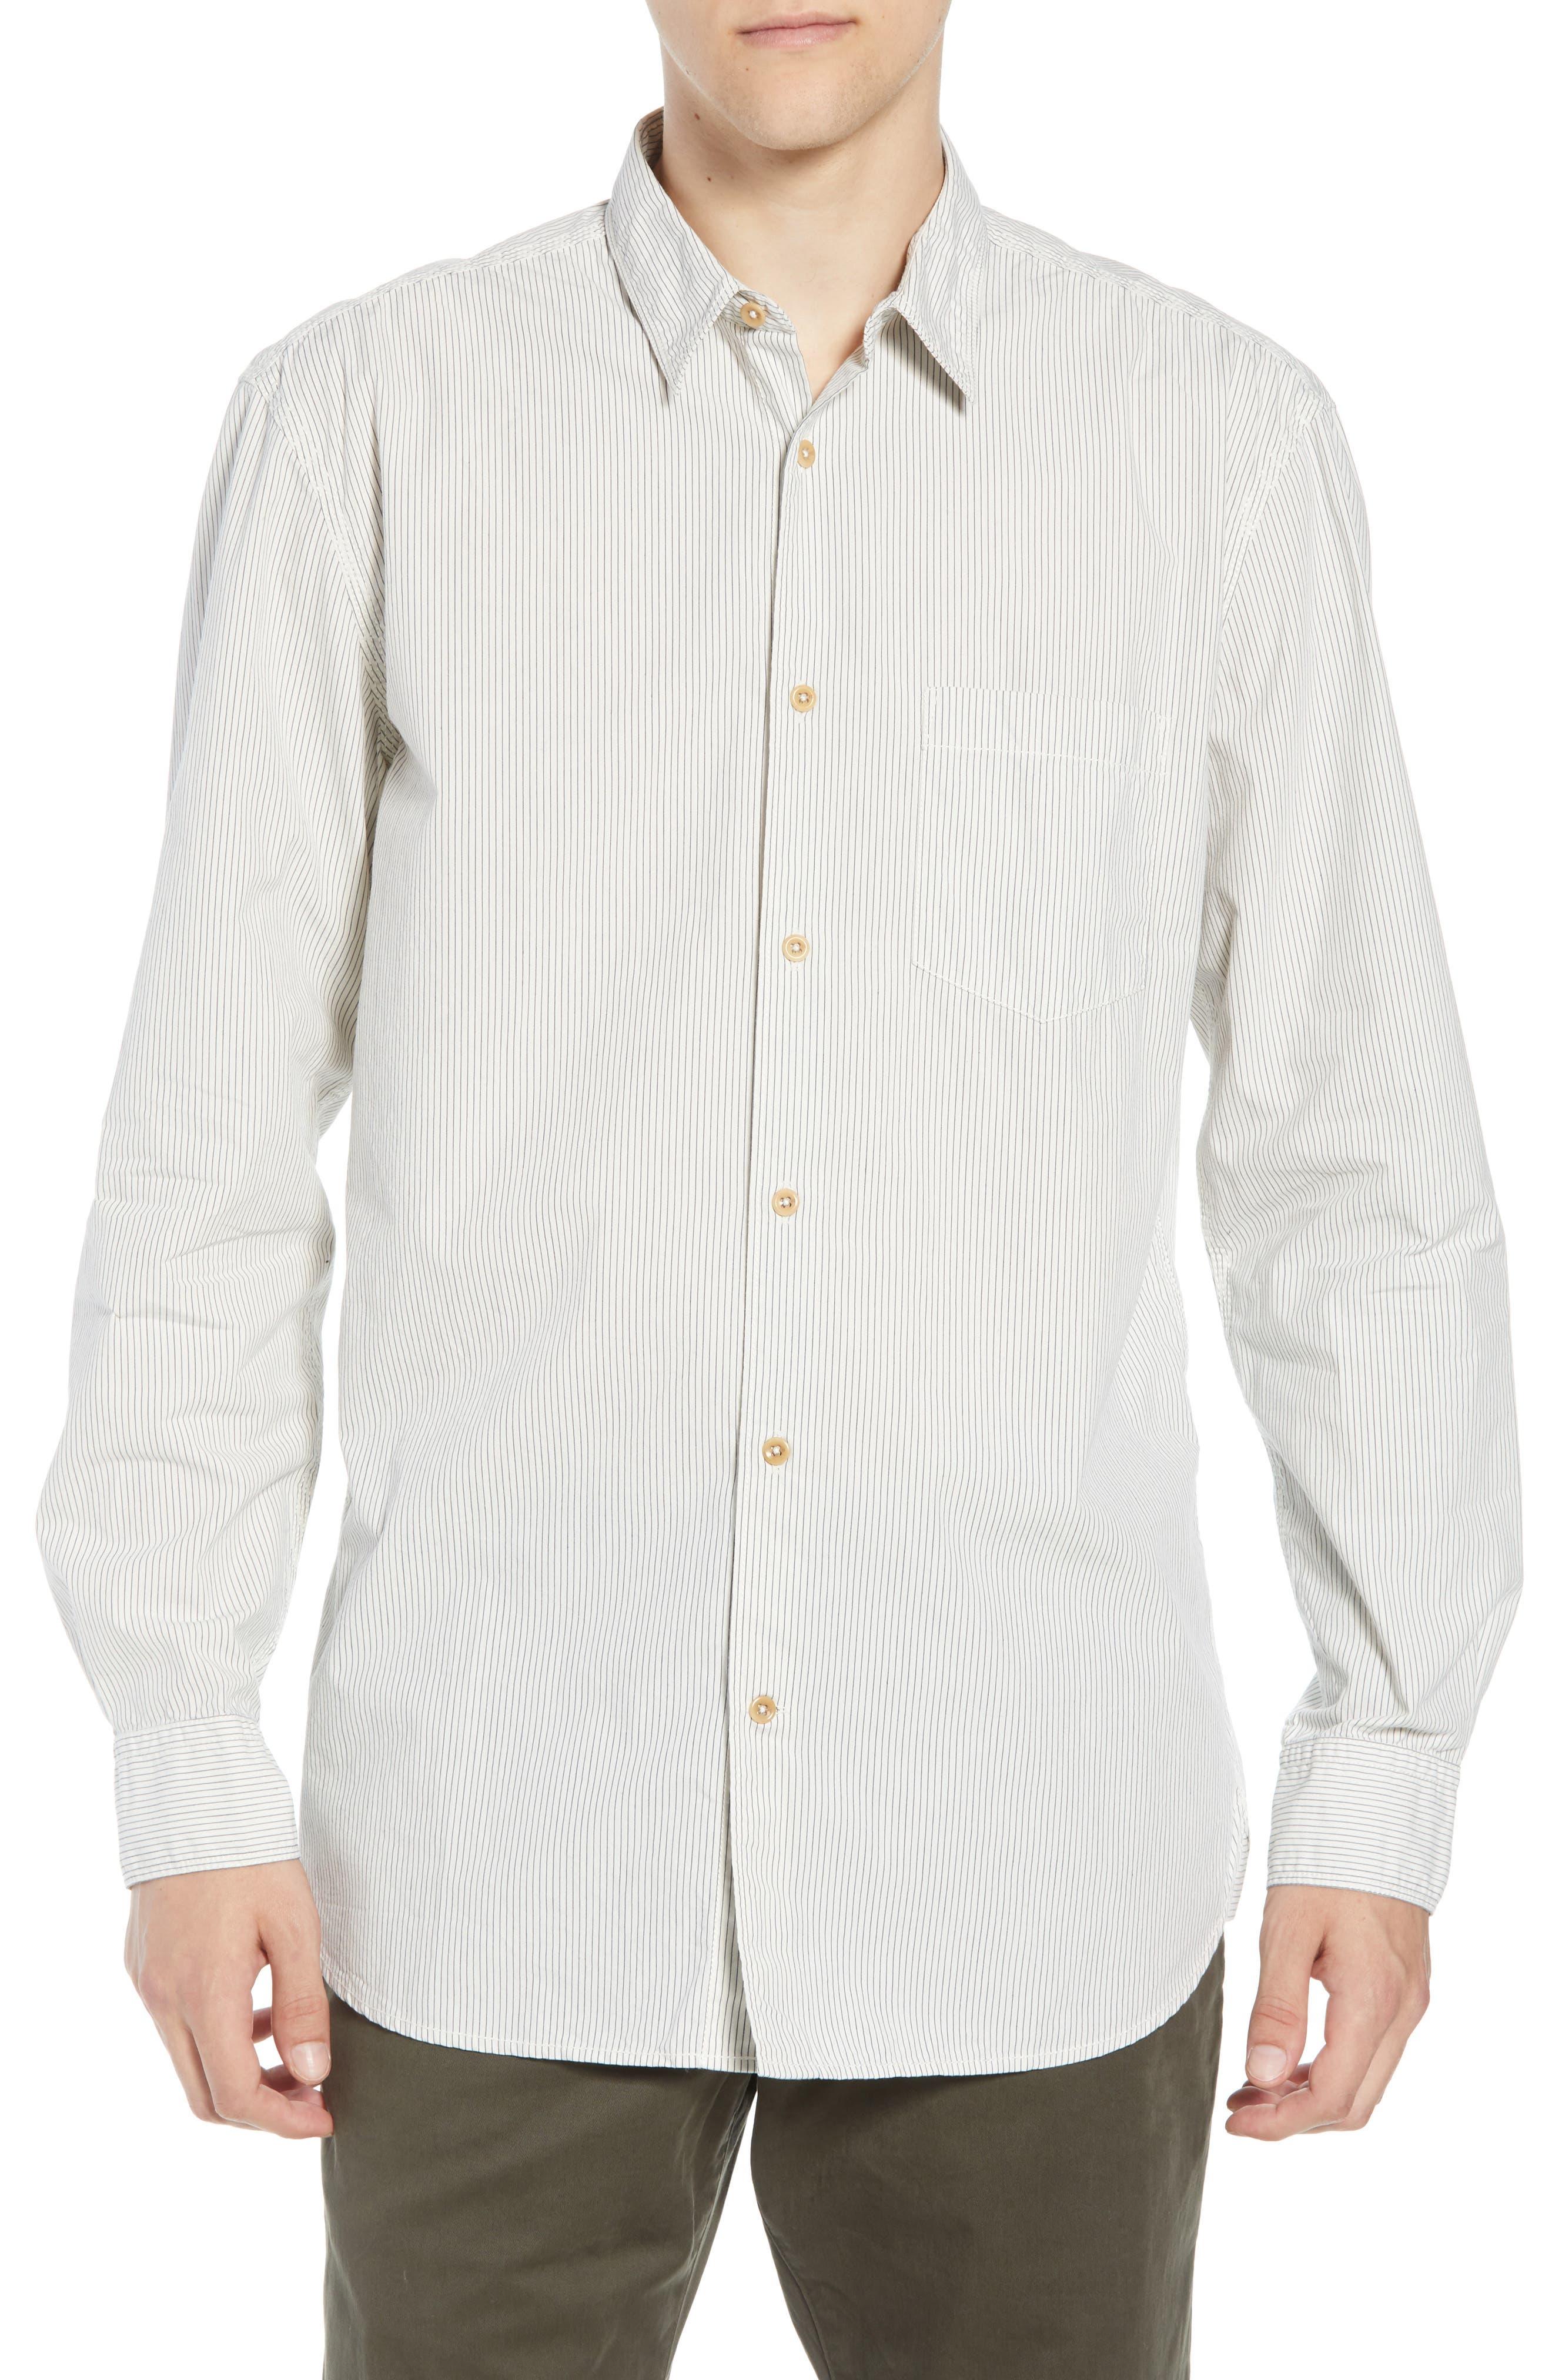 Core Peach Regular Fit Sport Shirt,                             Main thumbnail 1, color,                             400